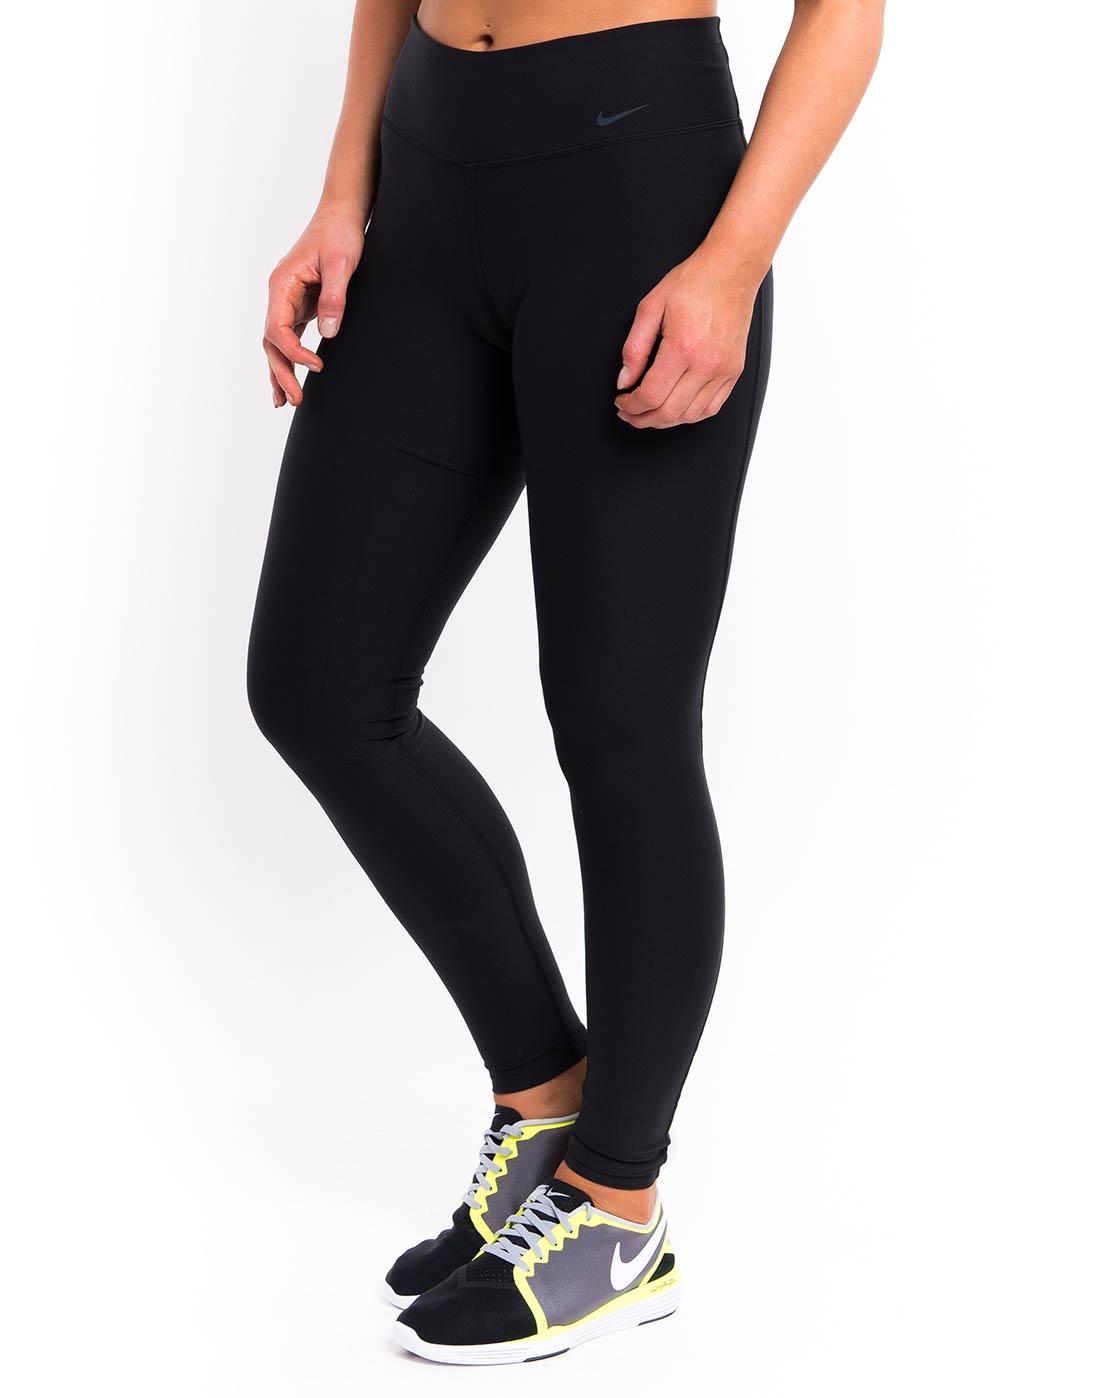 100889c850f3 Nike Womens Legend Tight Pant